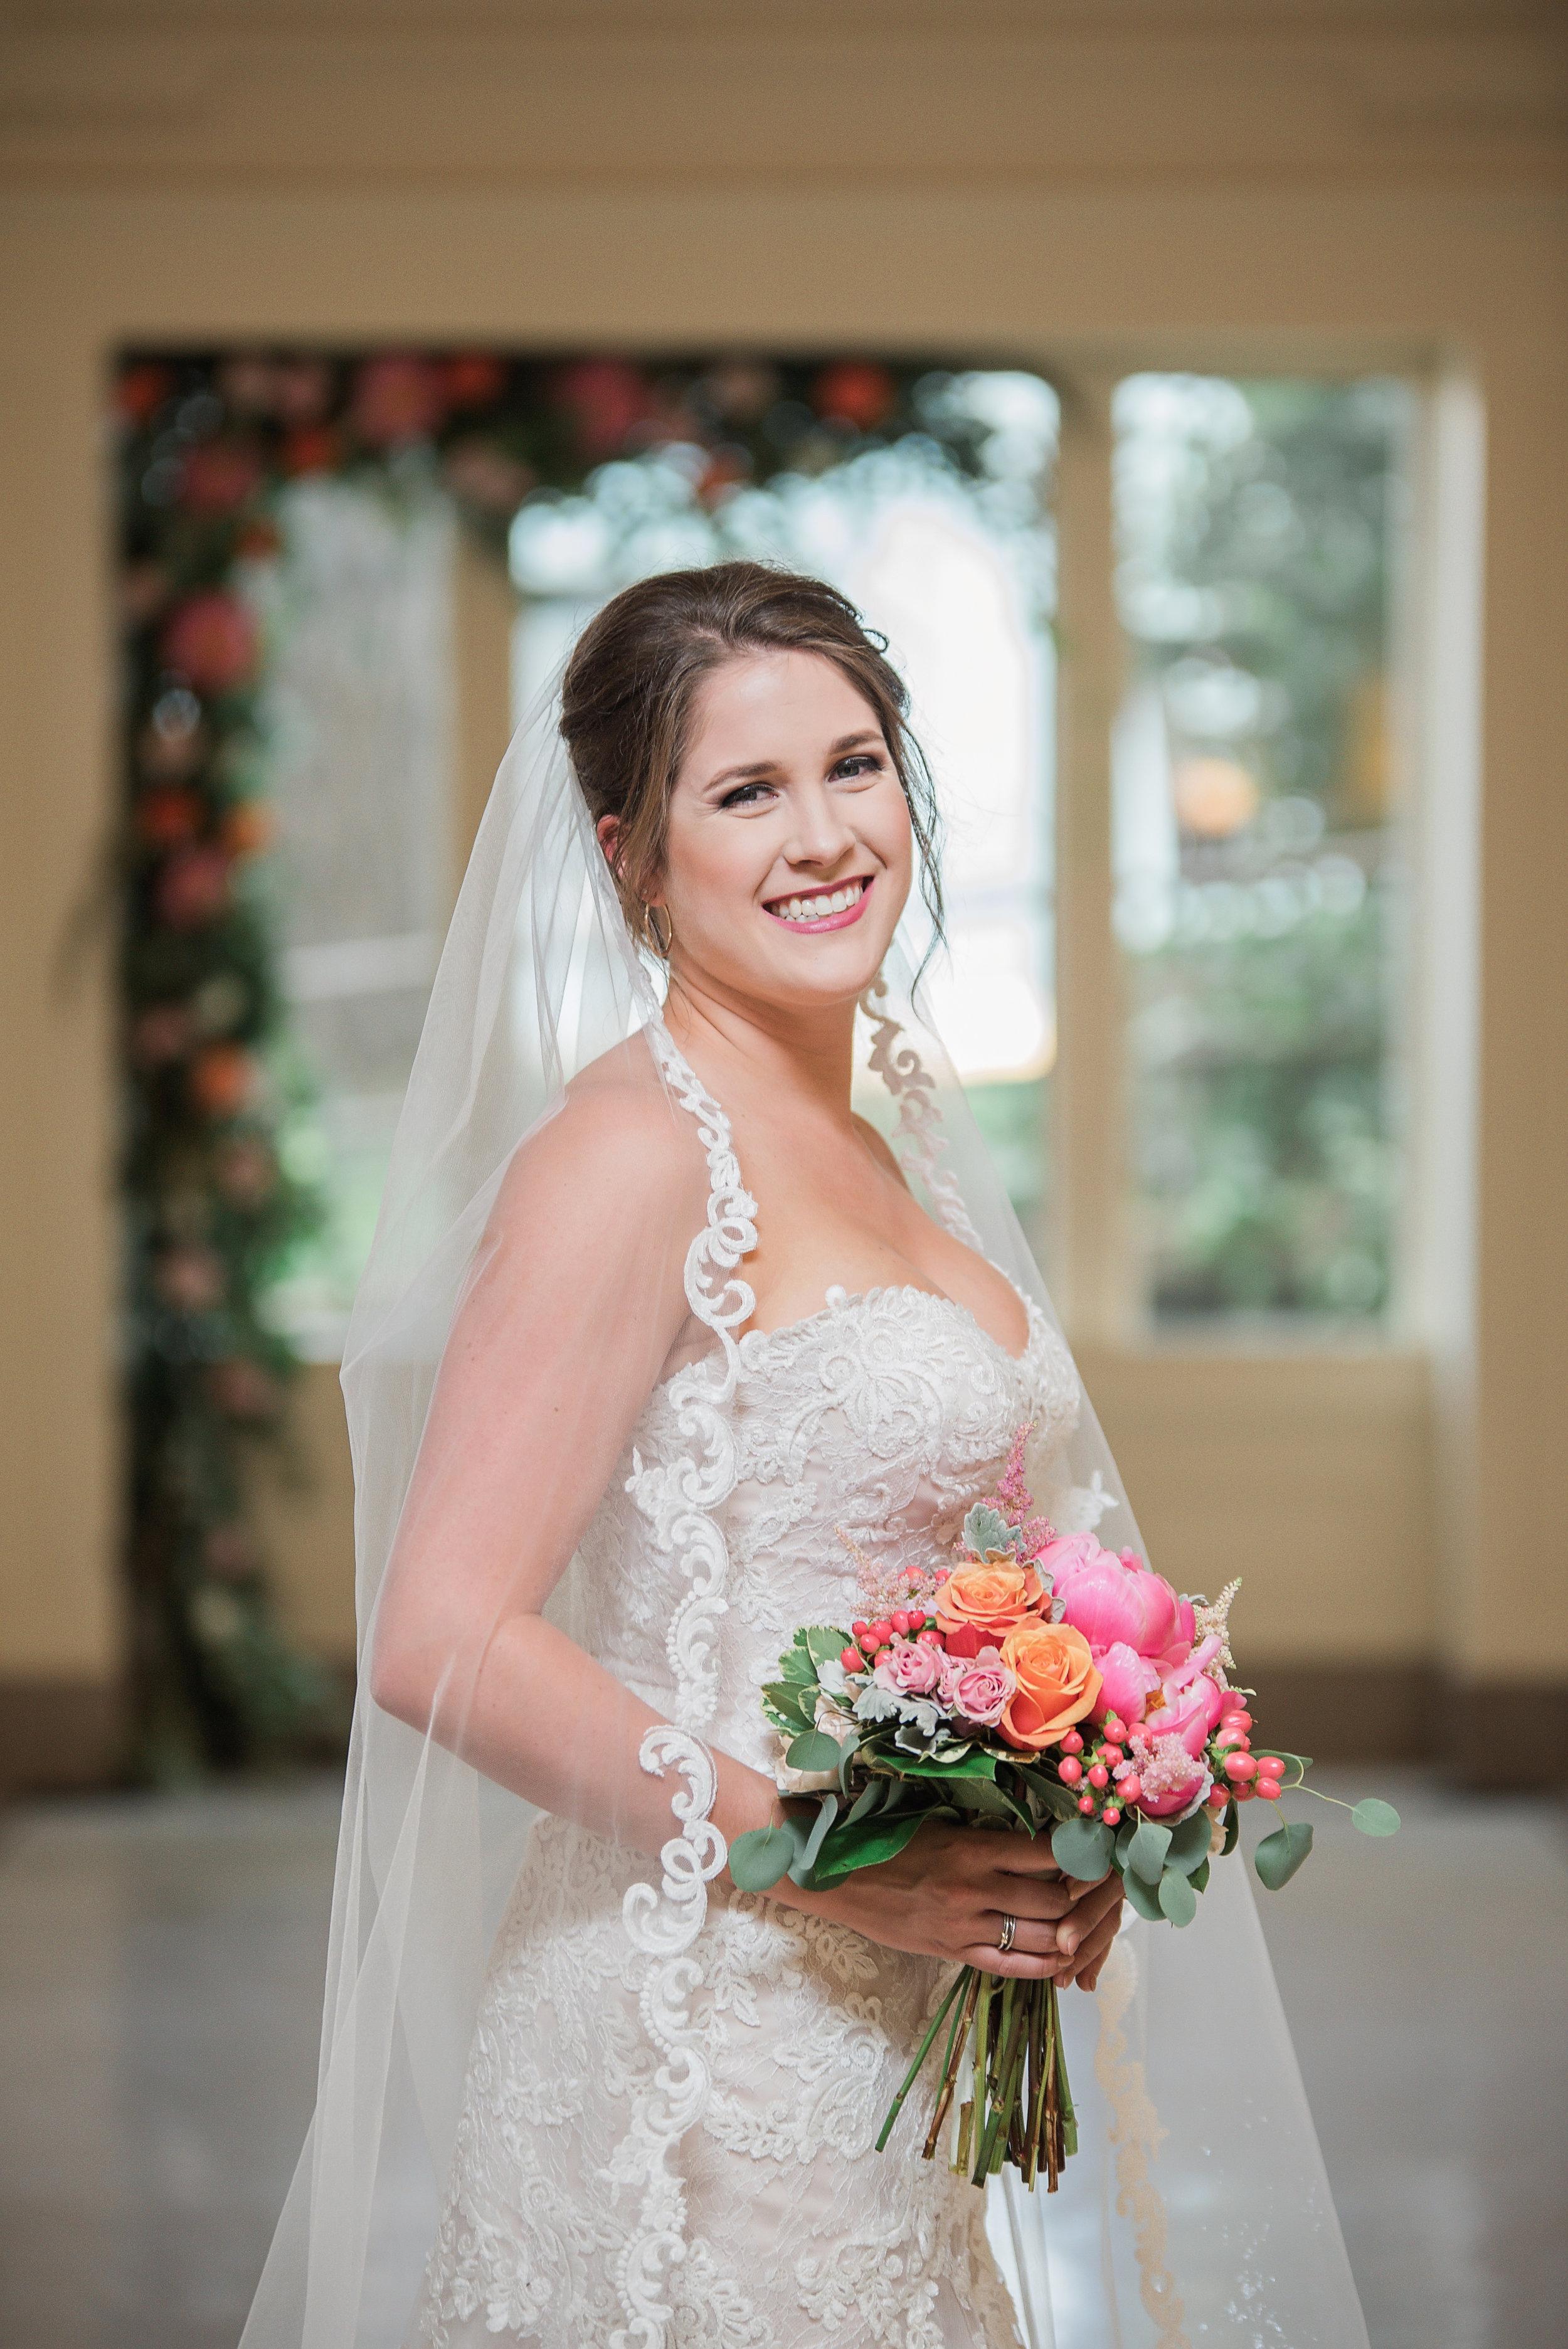 Rome Wedding 1st edits (14 of 36).jpg